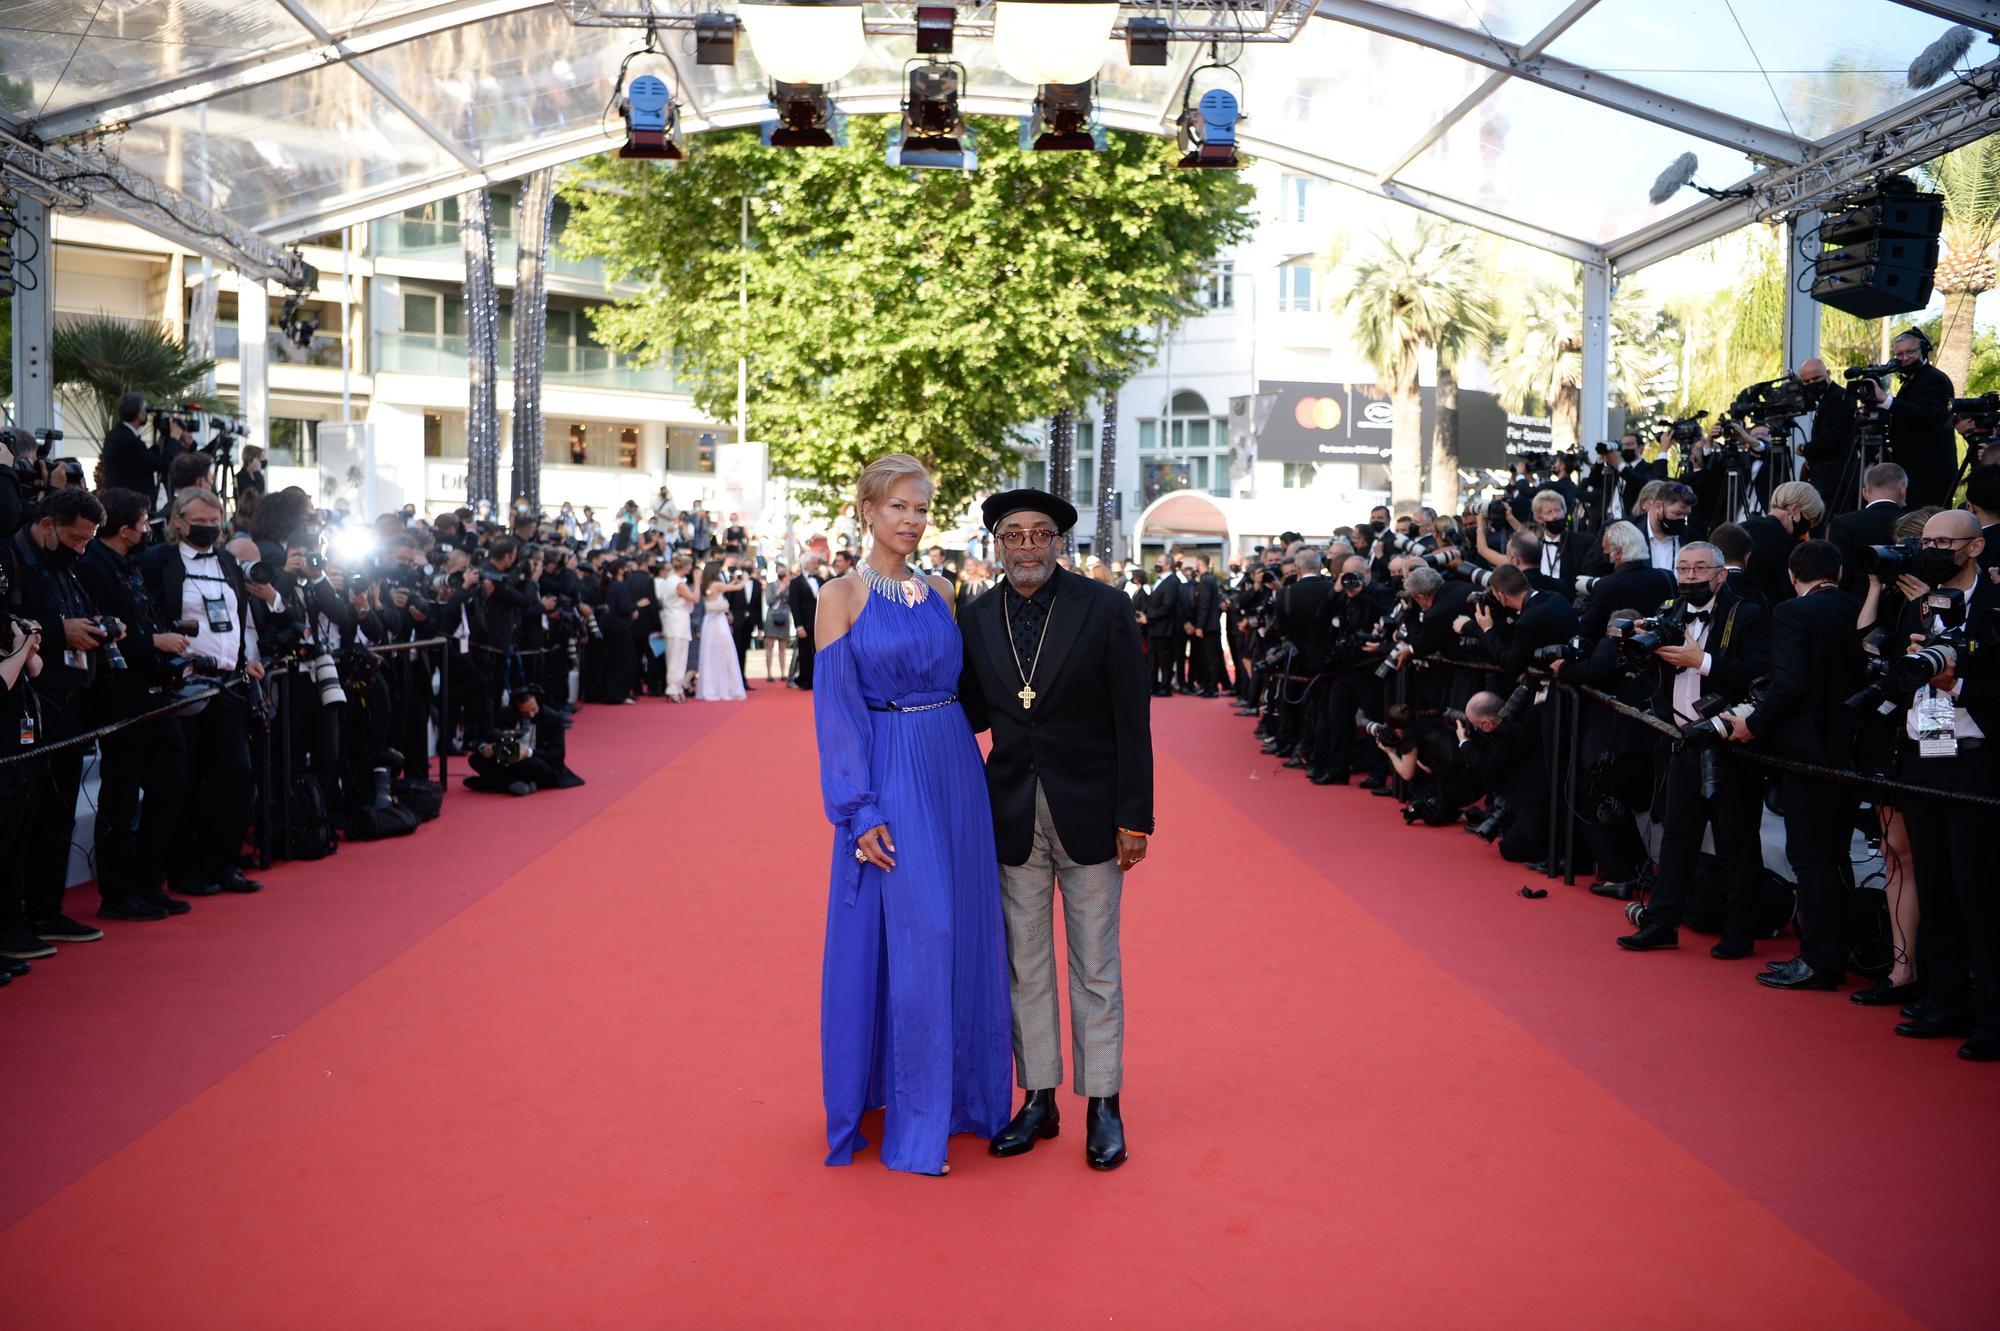 Festival de Cannes - Domingo 11 de julio